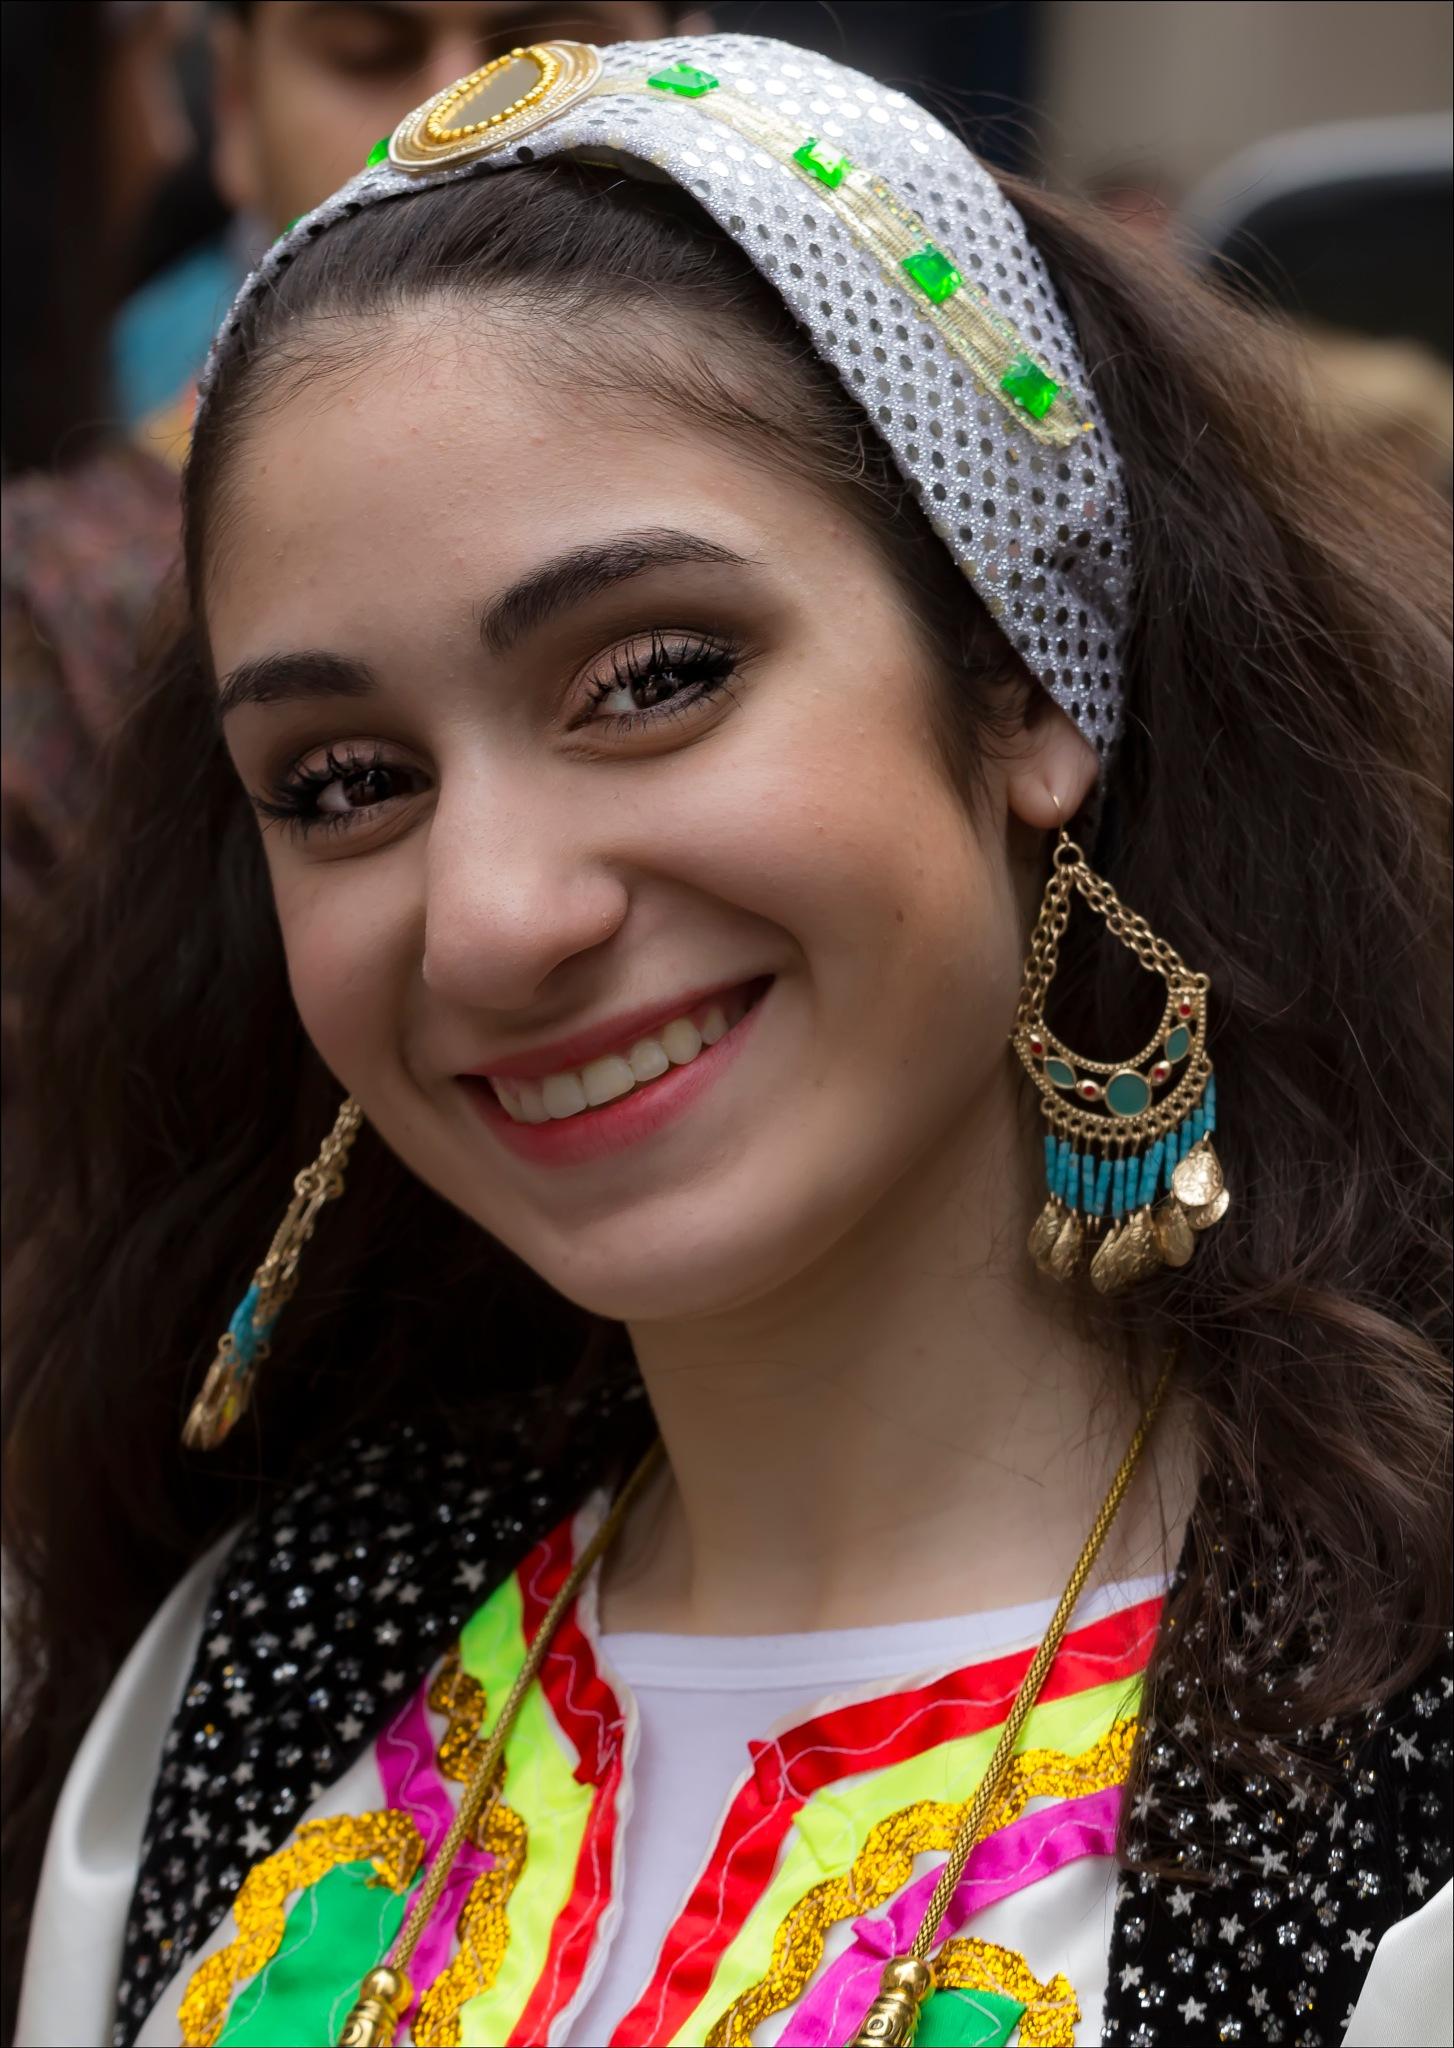 Persian Day Parade NYC 2017 by robertullmann